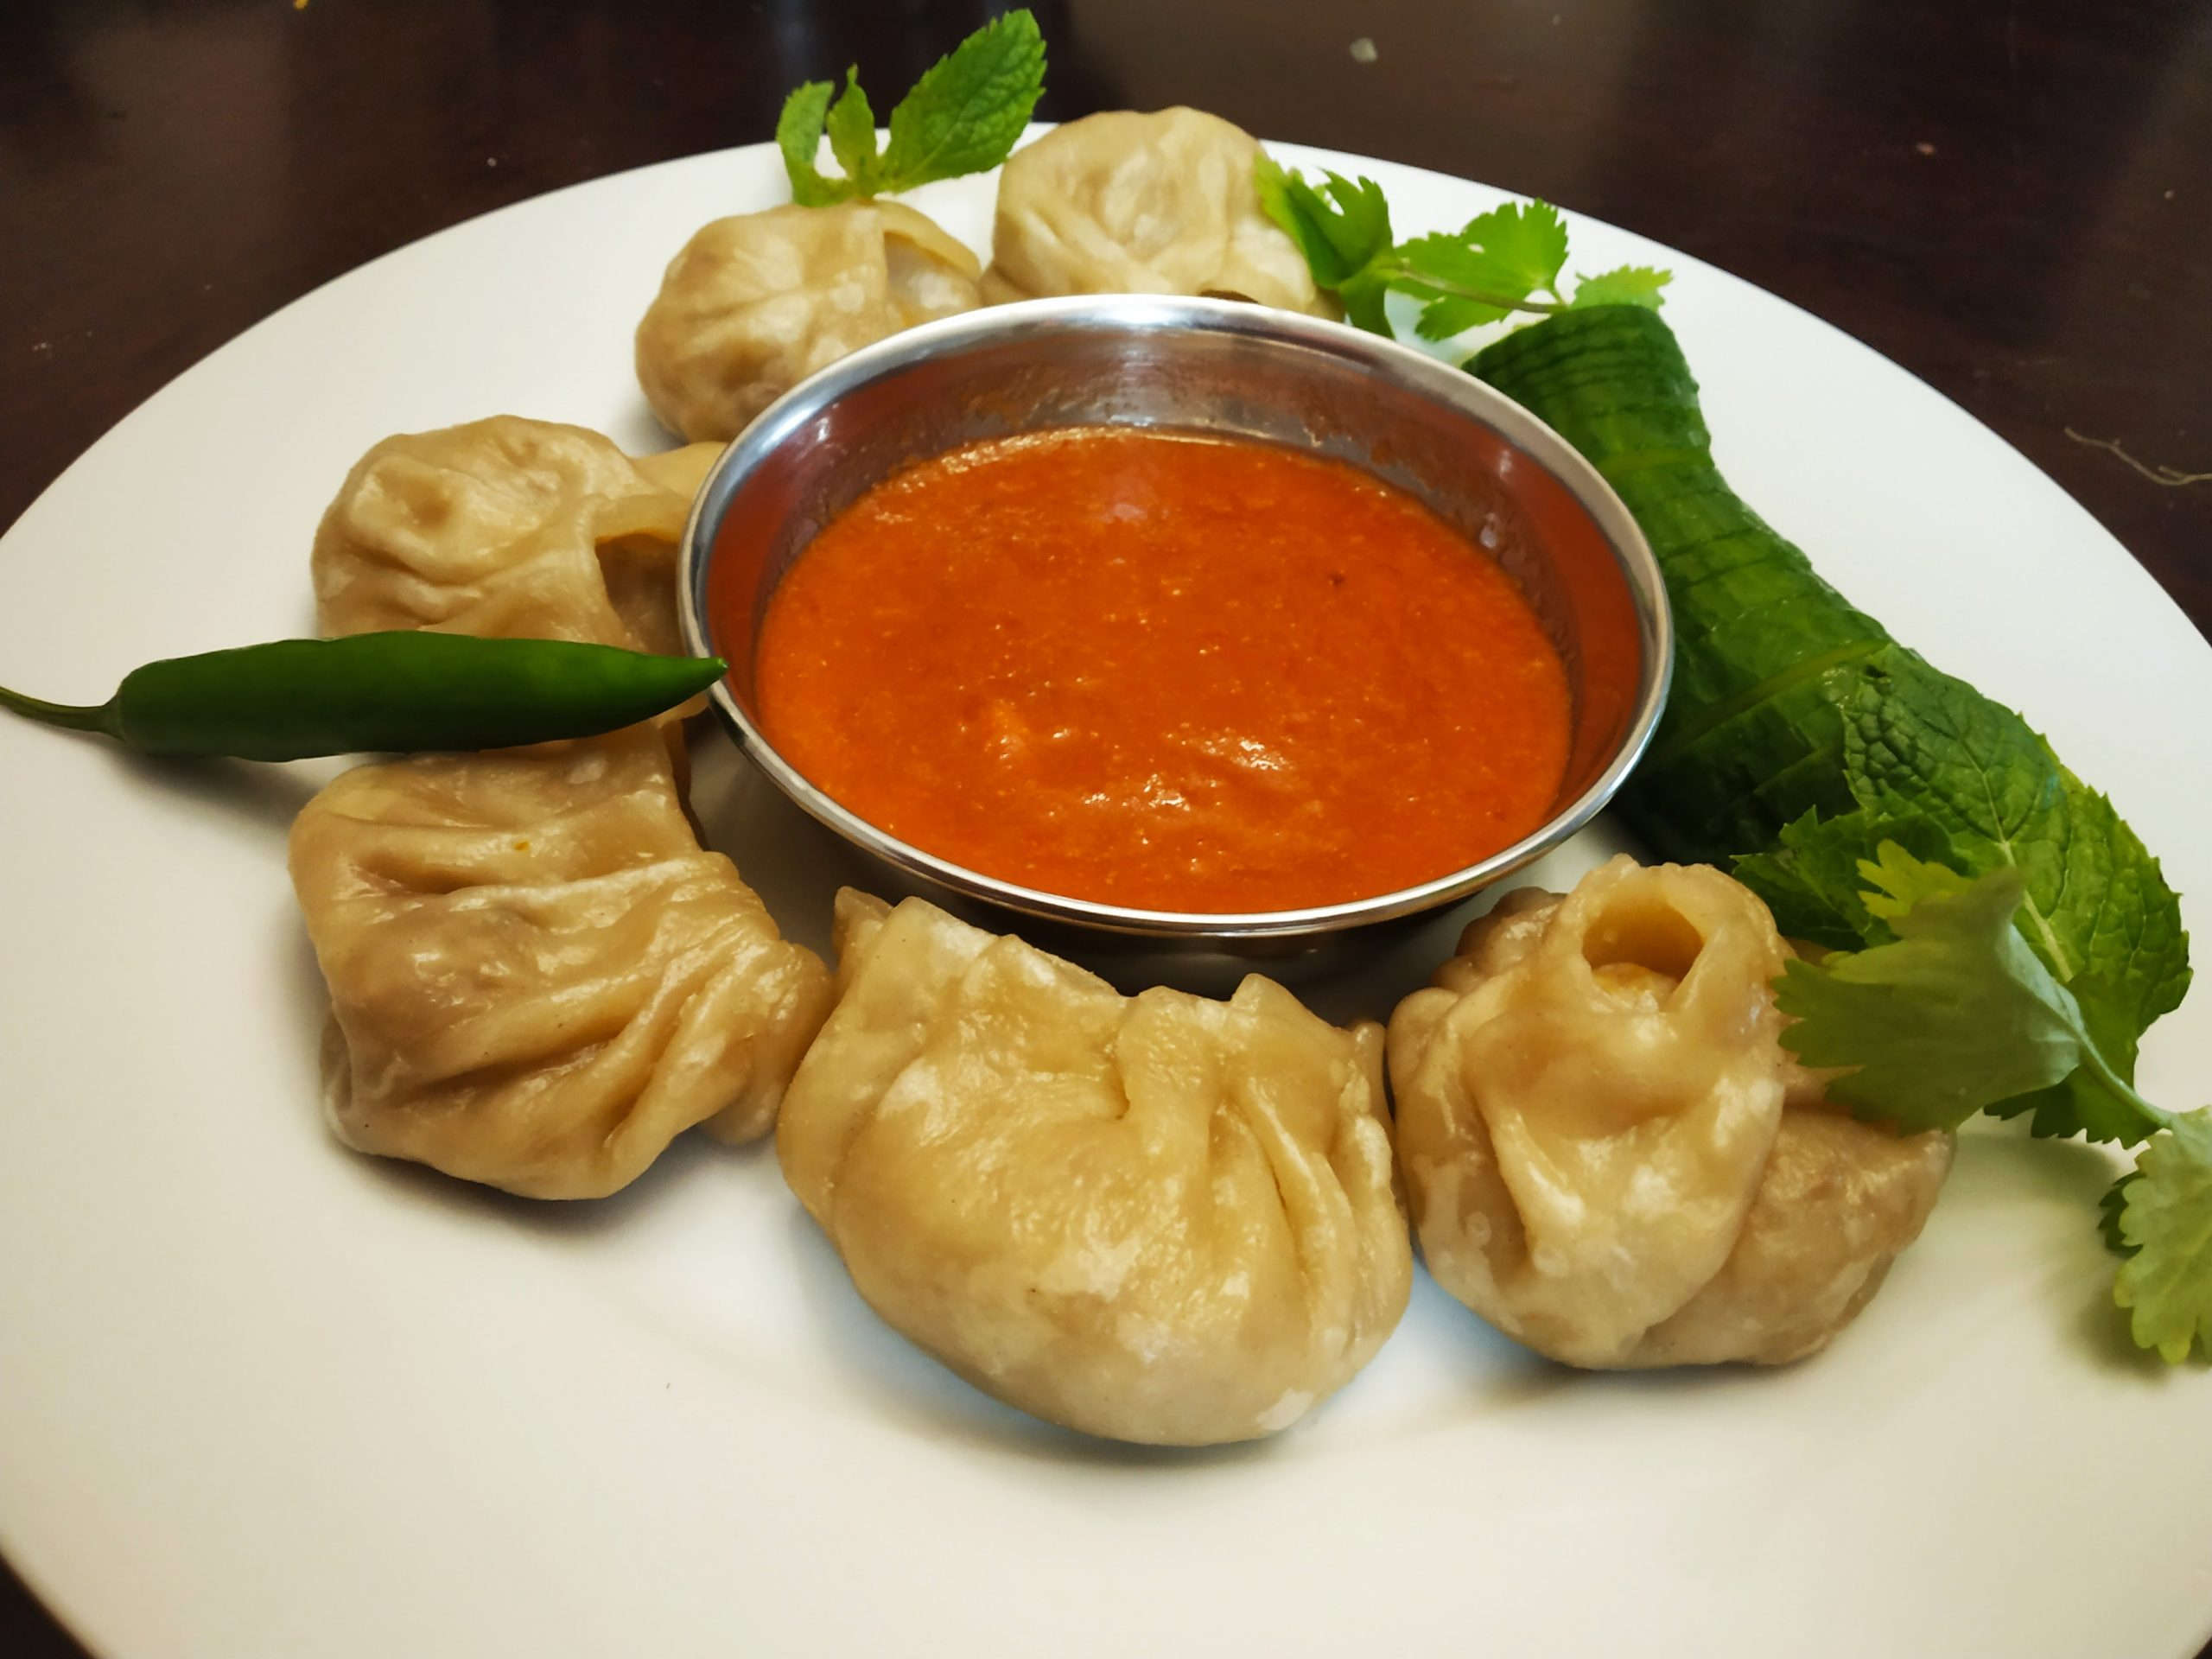 Momos - Best Street Foods In Bhubaneswar